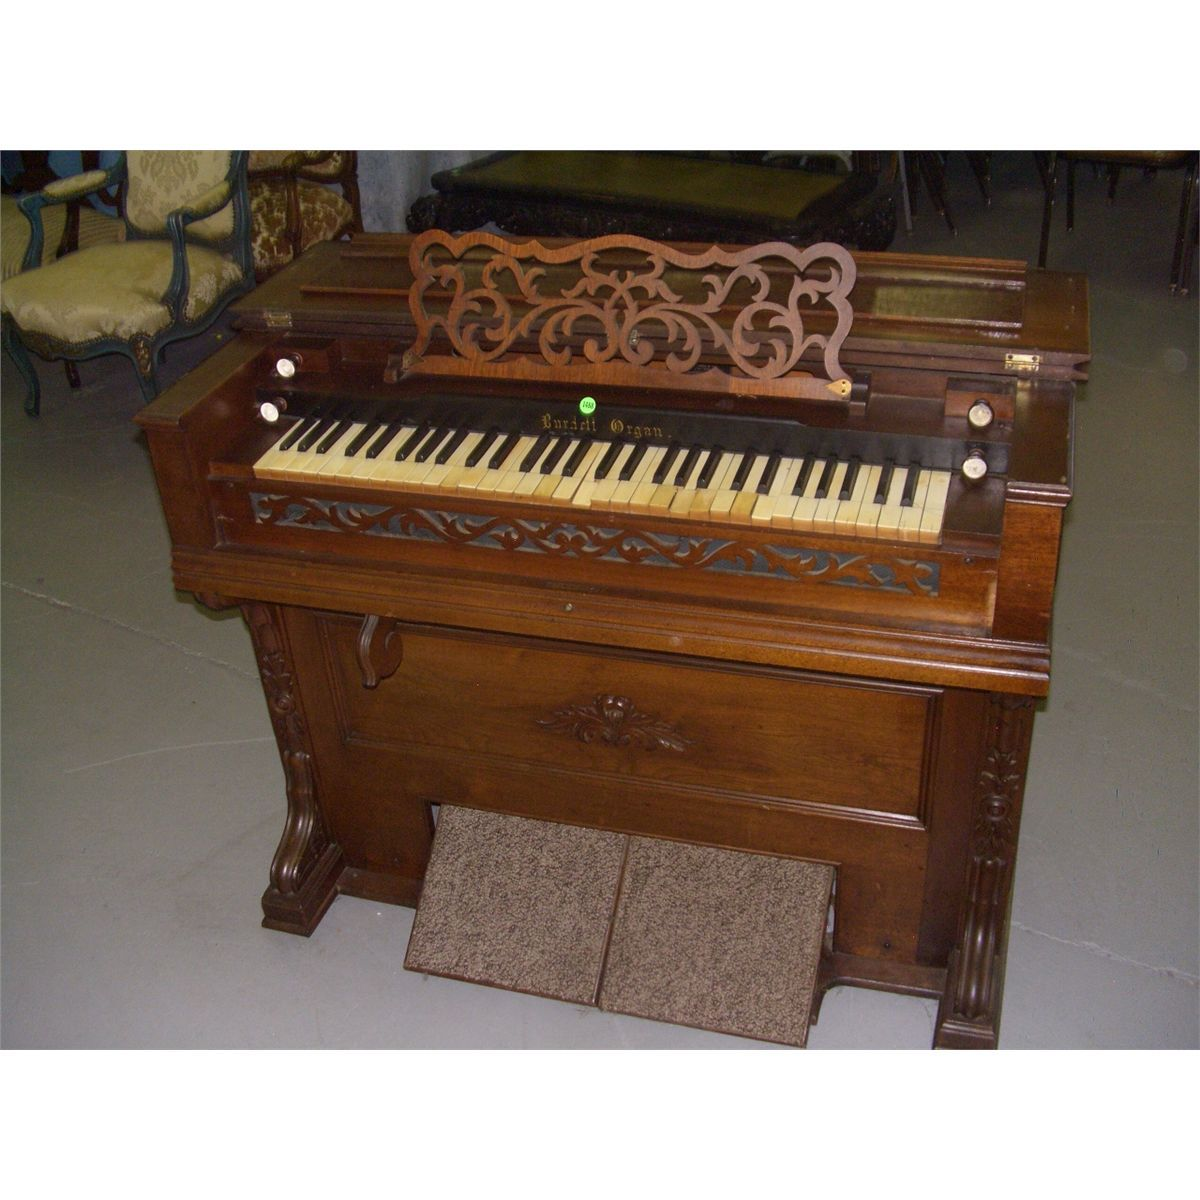 Petaluma Piano Movers are Sebastopol Piano Movers Northern ...